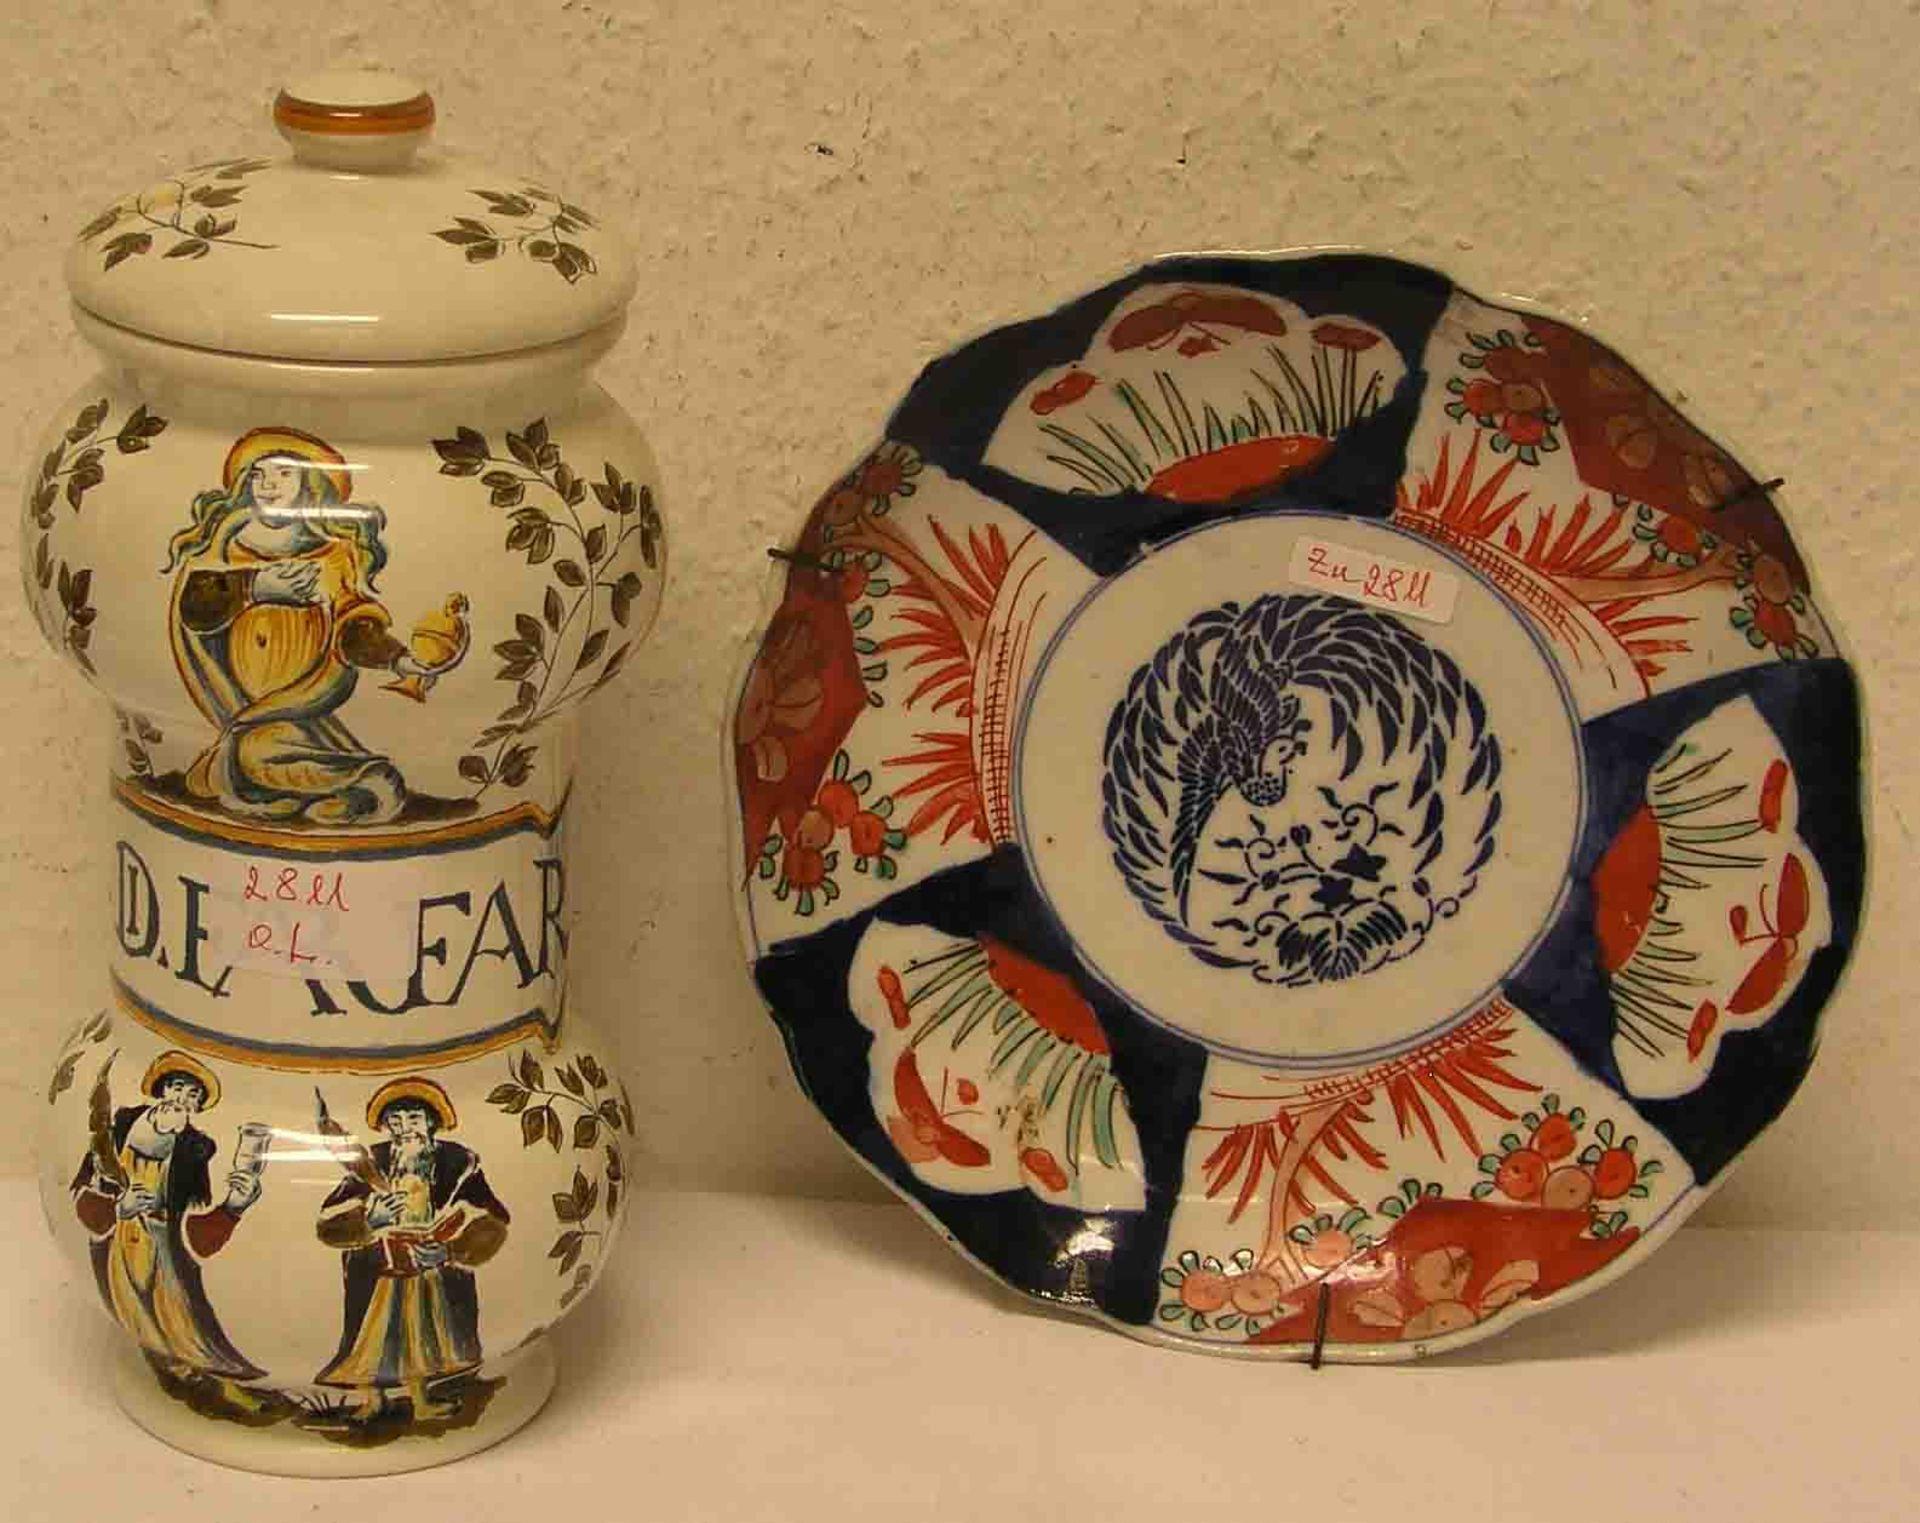 Apotheker Gefäß, Ulmer Keramik, Höhe: